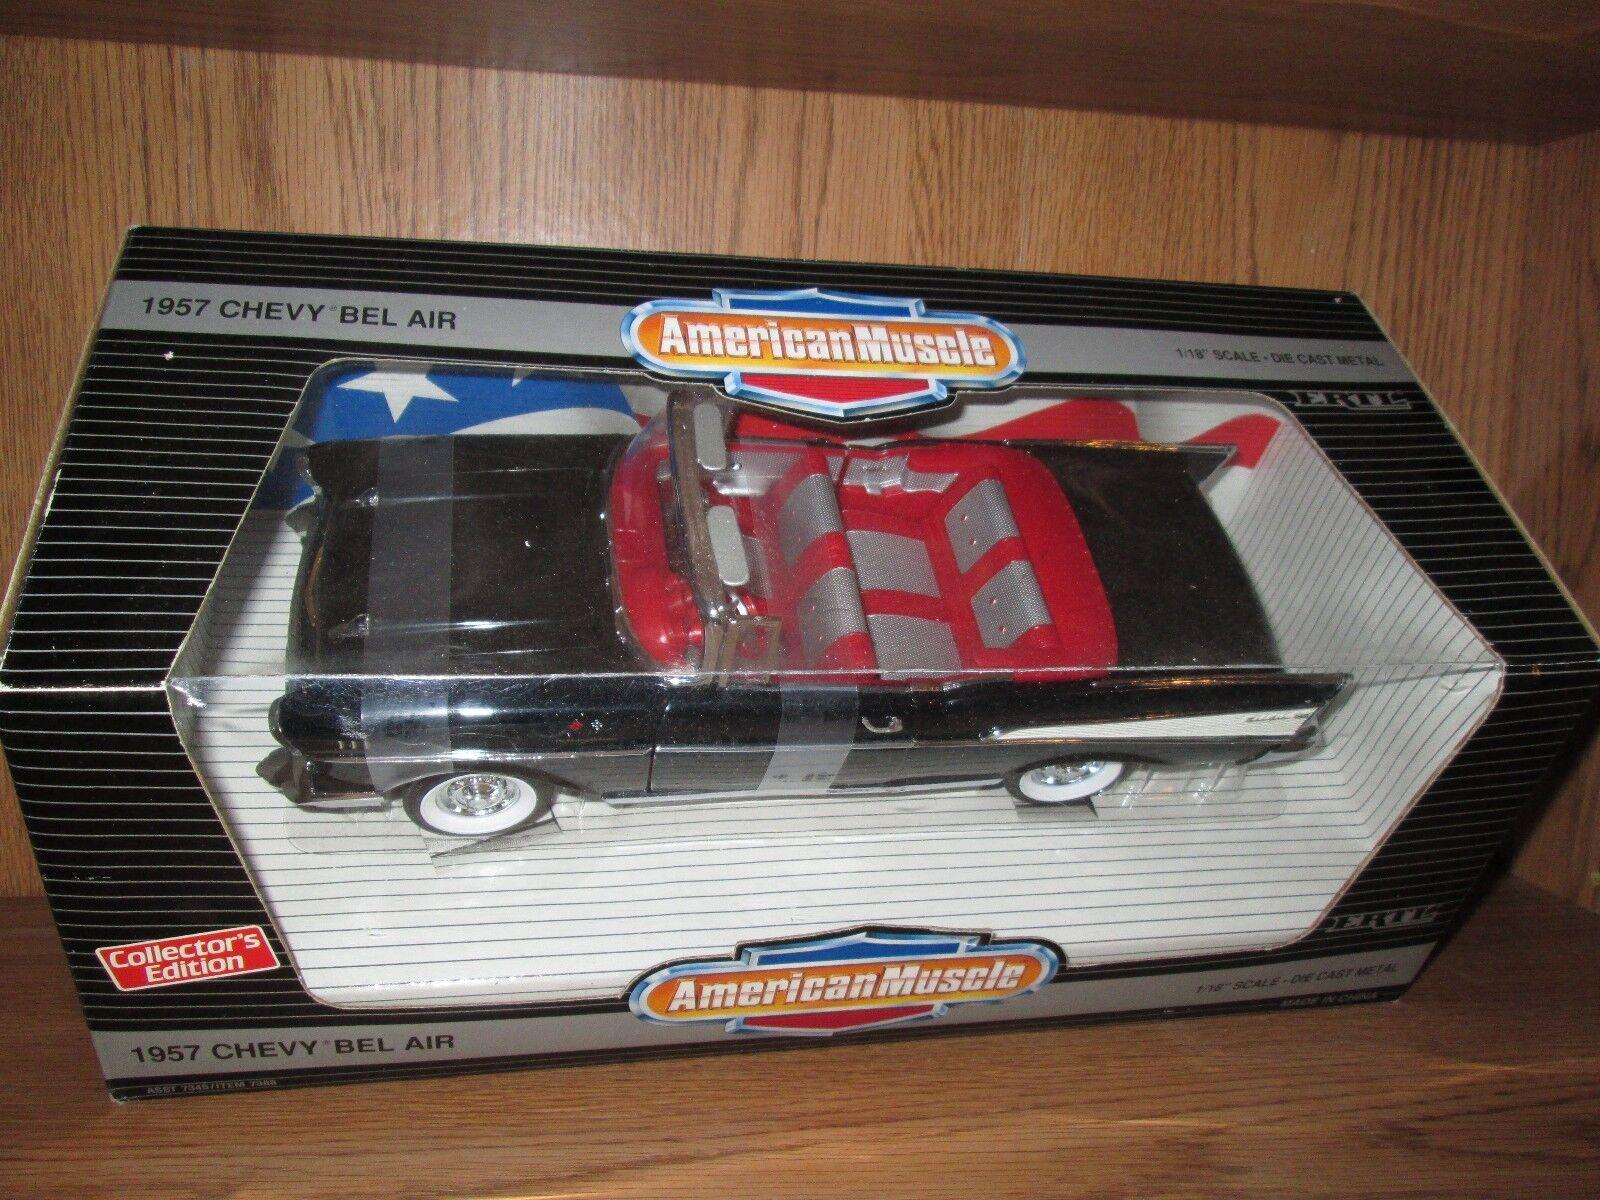 1957 CHEVY BELAIR CONGrünIBLE schwarz 57 american muscle 1 18 7388 rare wedge box